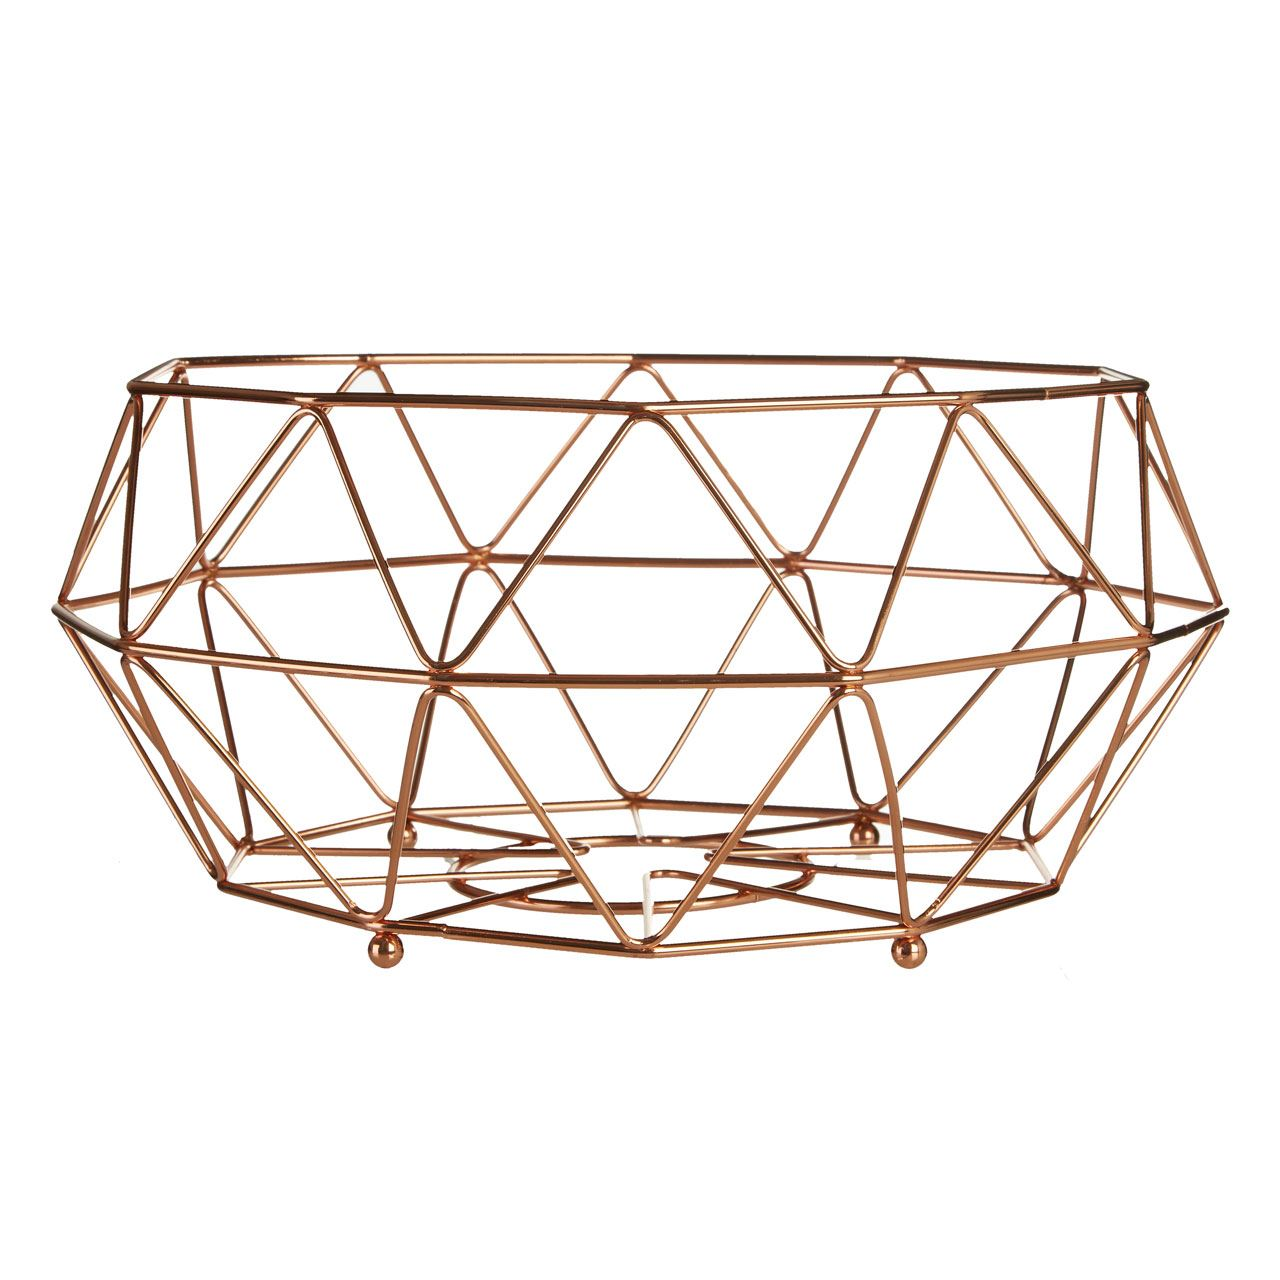 copper kitchen utensil holder remodel tucson vertex accessory set basket trivet